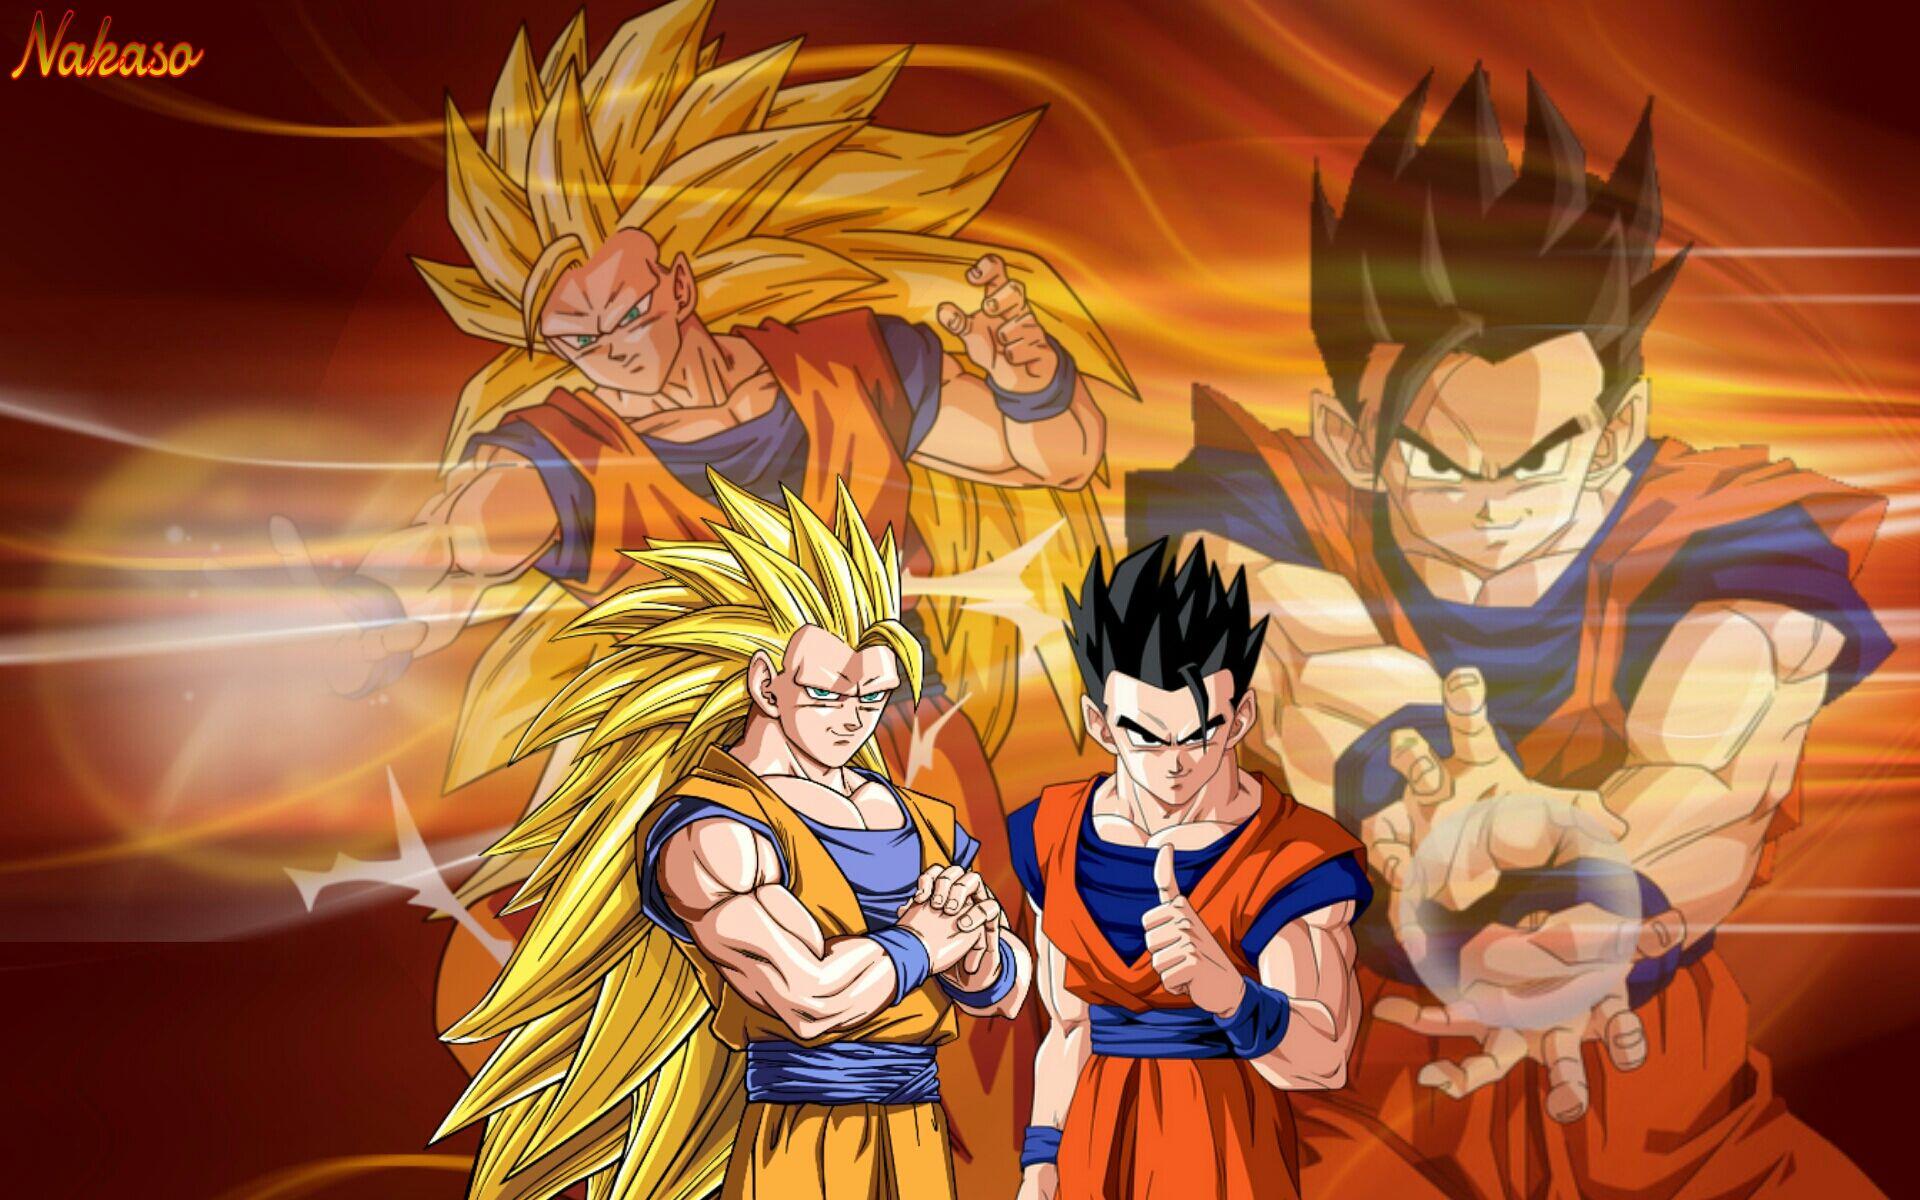 DBZ: Goku SSj3 vs mystic Gohan by hose1985 on DeviantArt